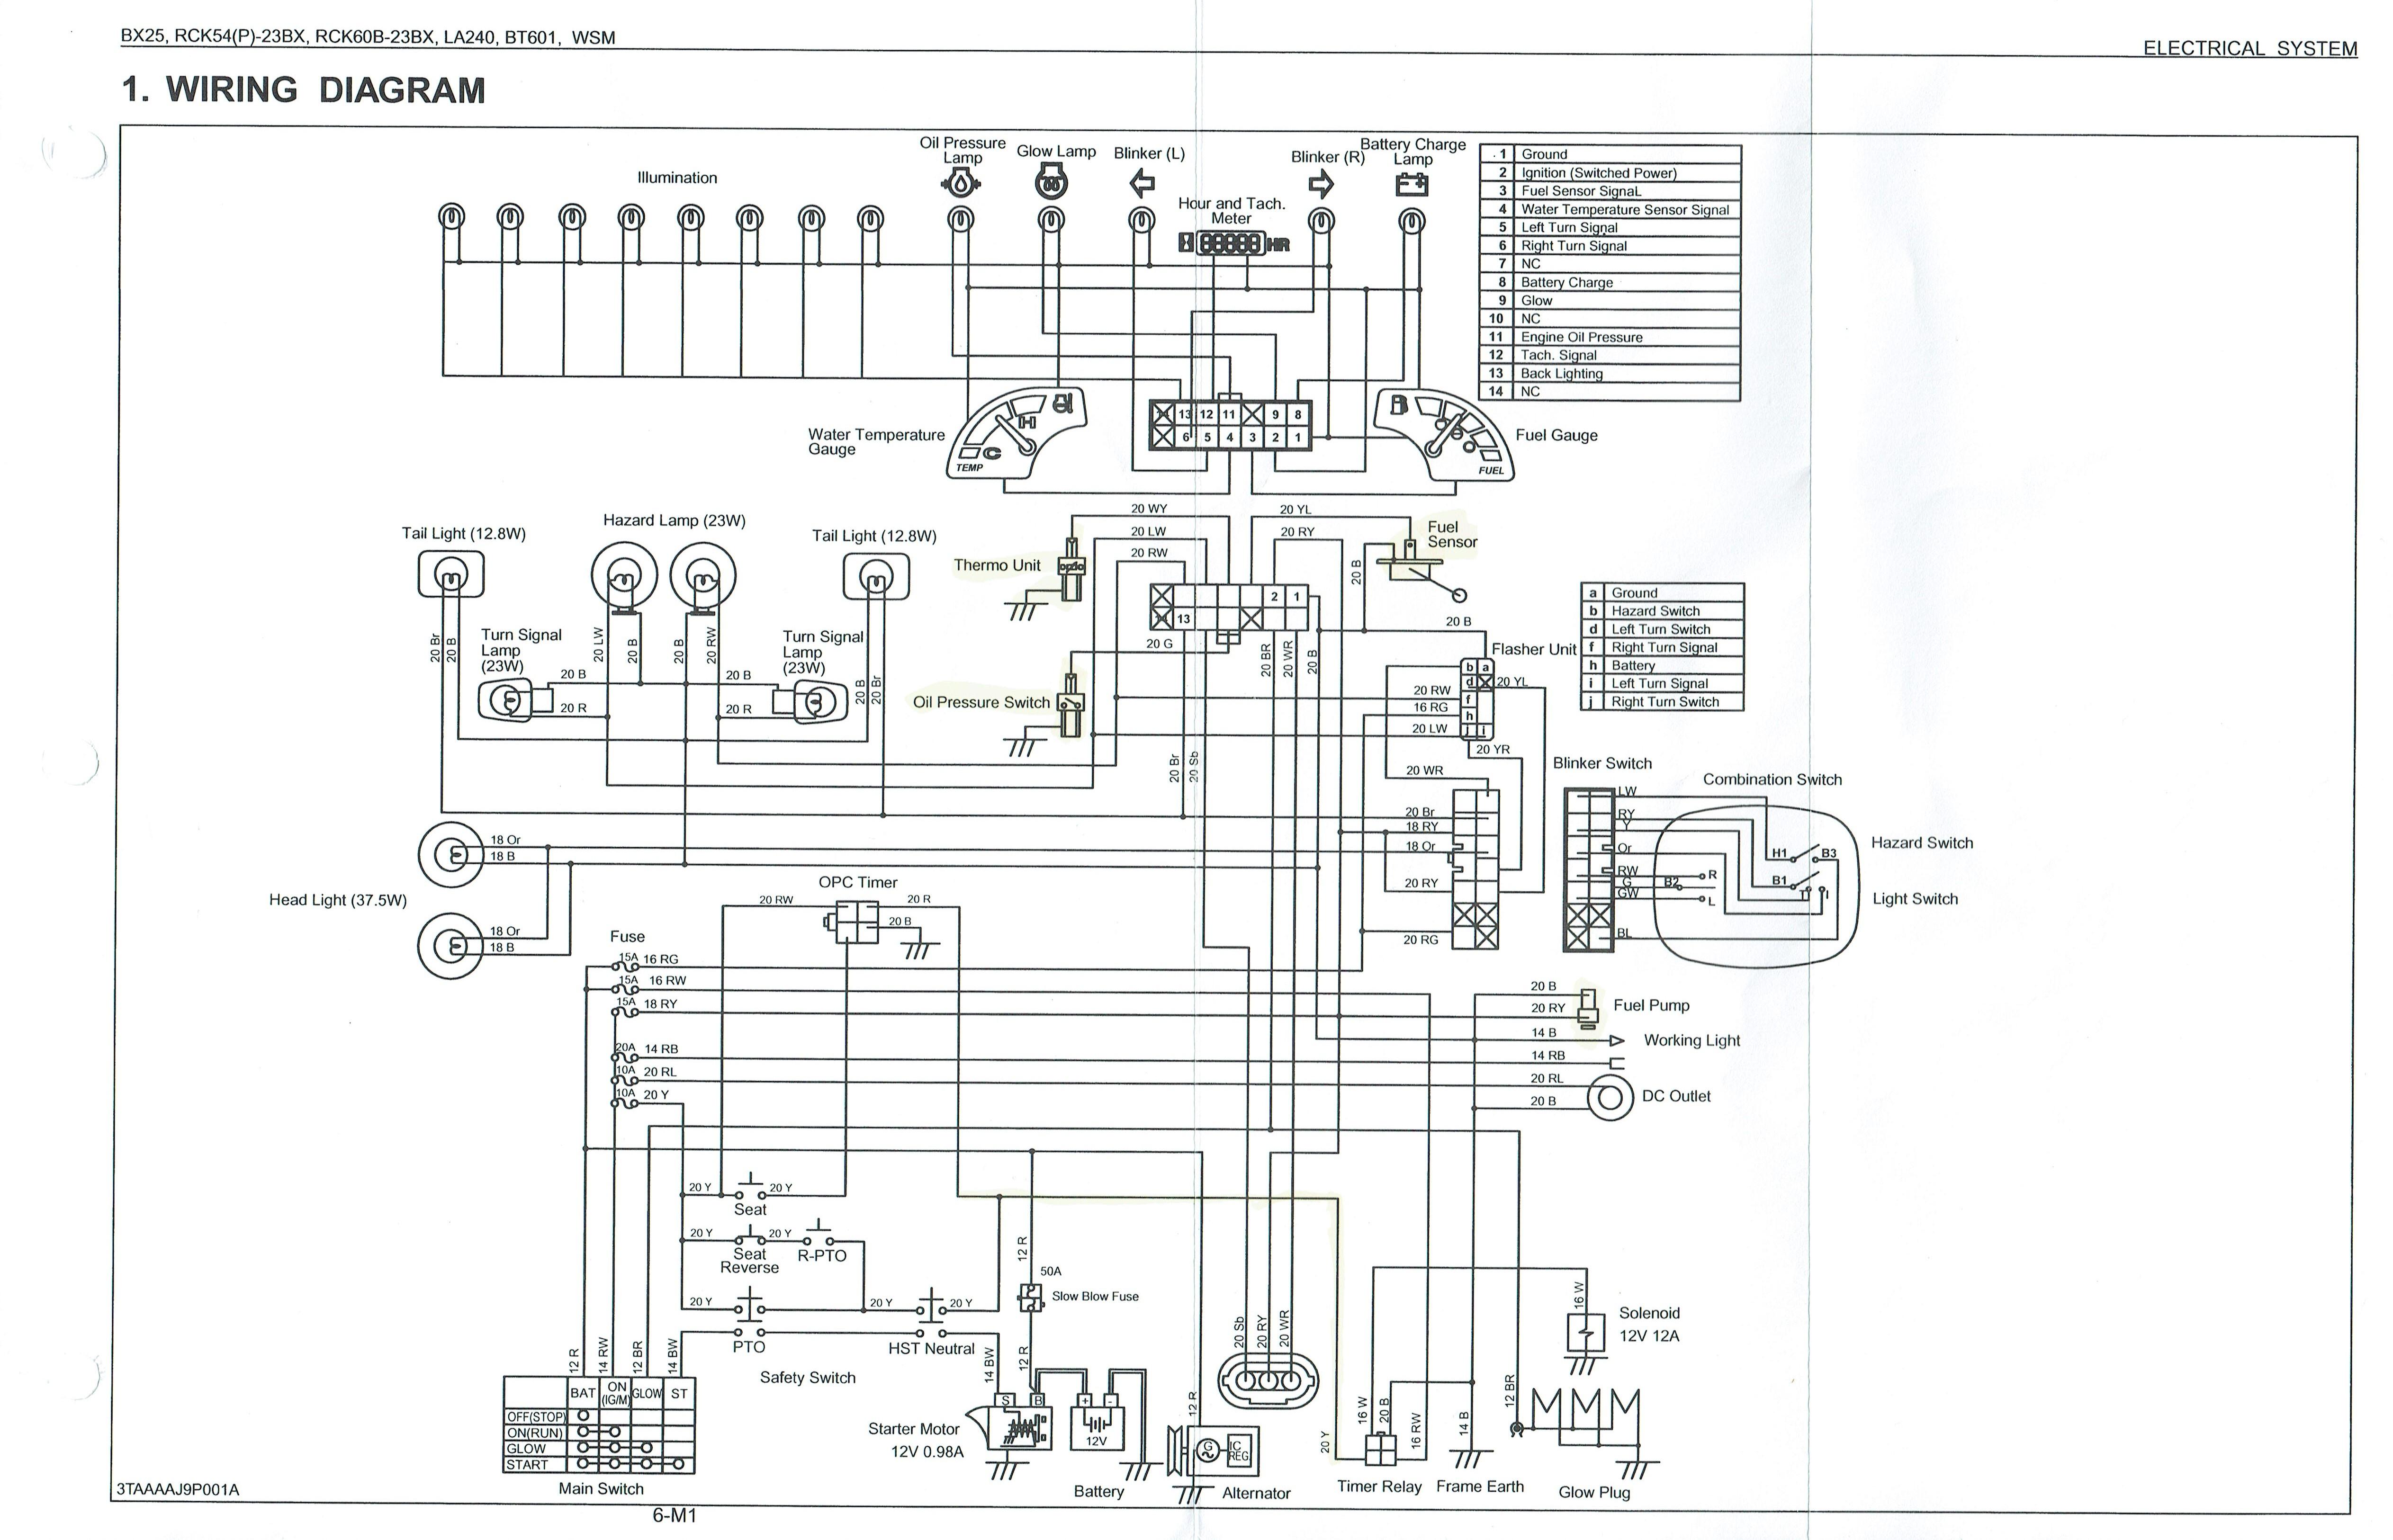 Need Help Troubleshooting Fuel Shut f System Bx24 Kubota Tractor Kill Relay Wiring Diagrams